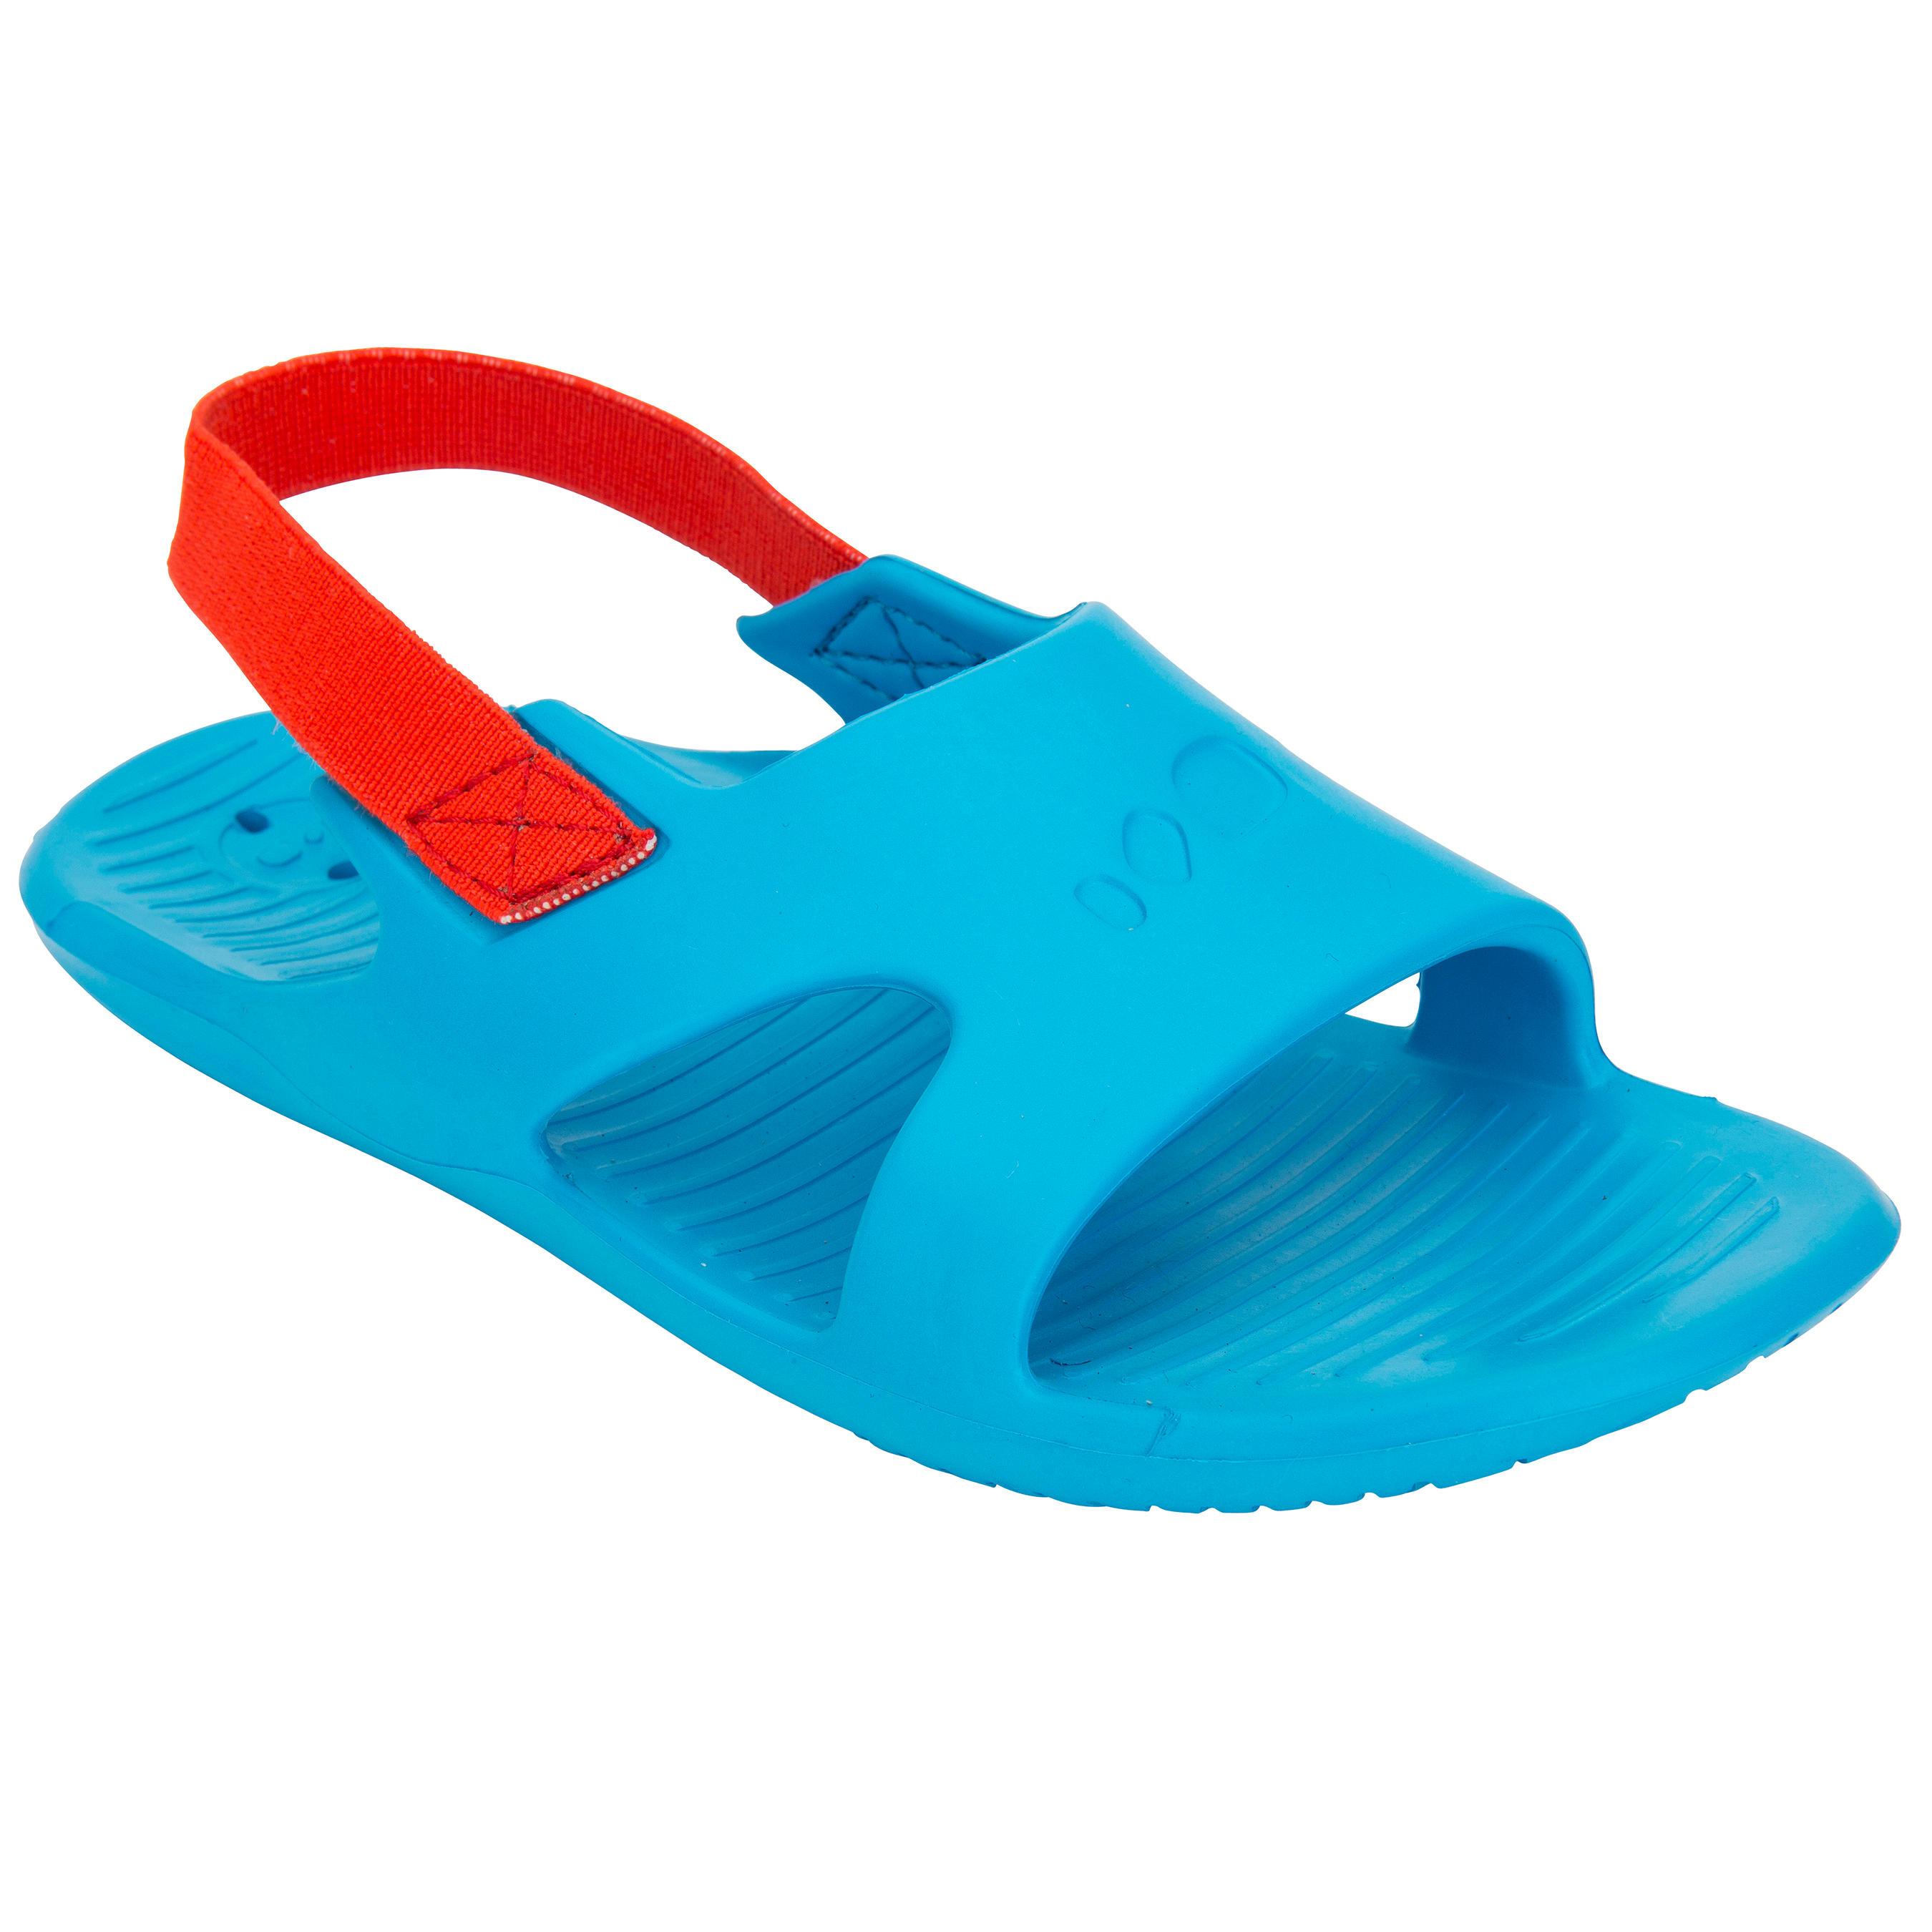 BOYS' SWIMMING POOL SANDALSNATASLAP - BLUE RED